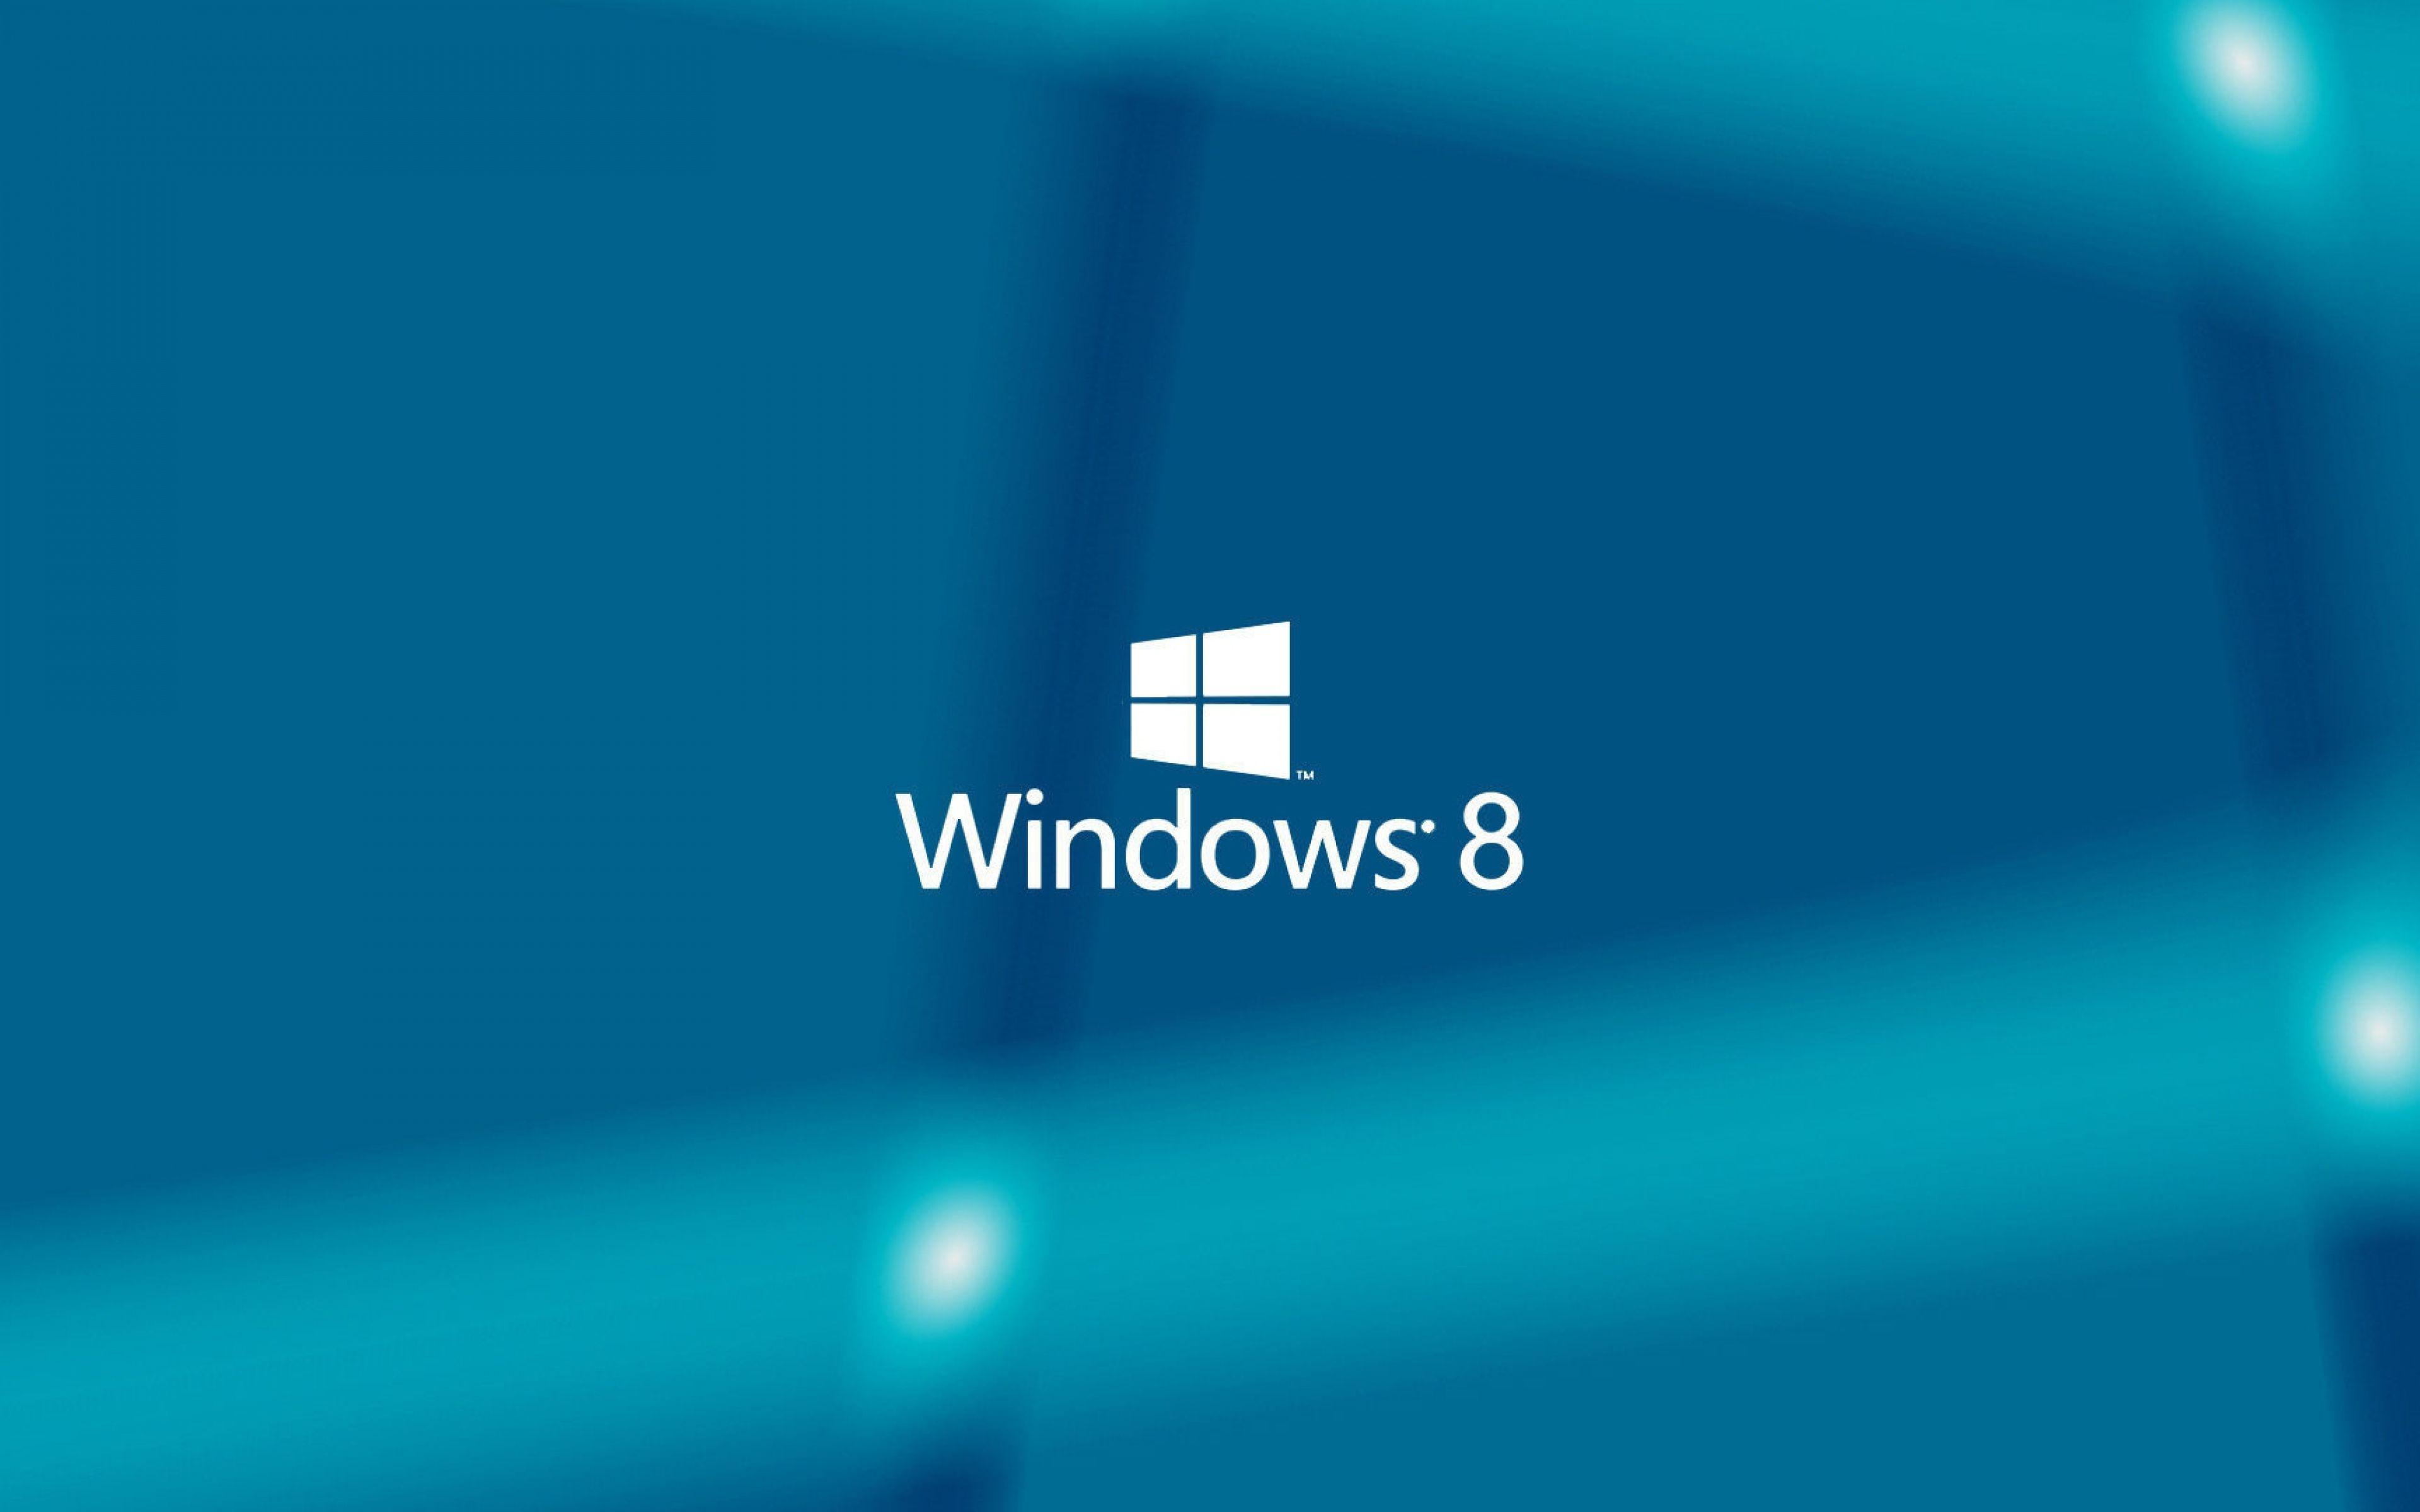 Ultra Hd Windows Wallpapers Top Free Ultra Hd Windows Backgrounds